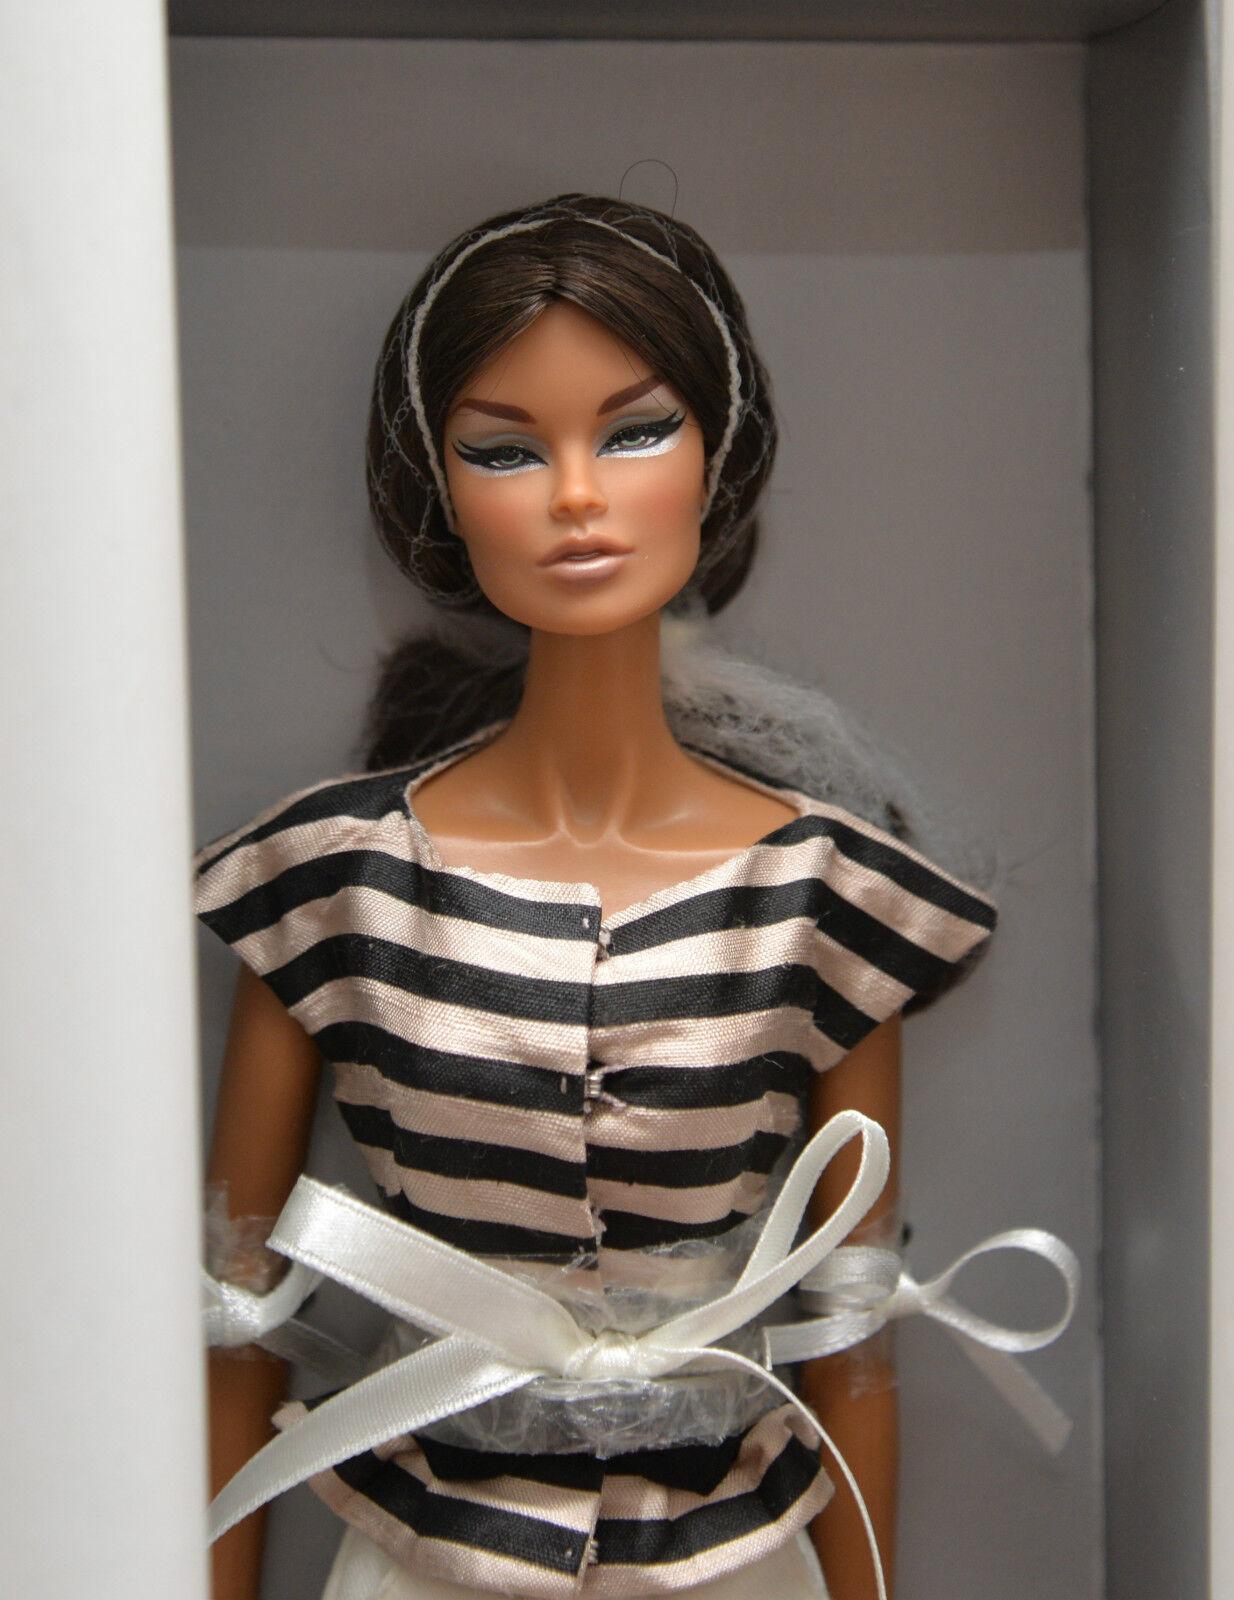 Raro Fashion Royalty de caja caja caja de control de crucero Vanessa Perrin W club exclusivo 2009  perfecto